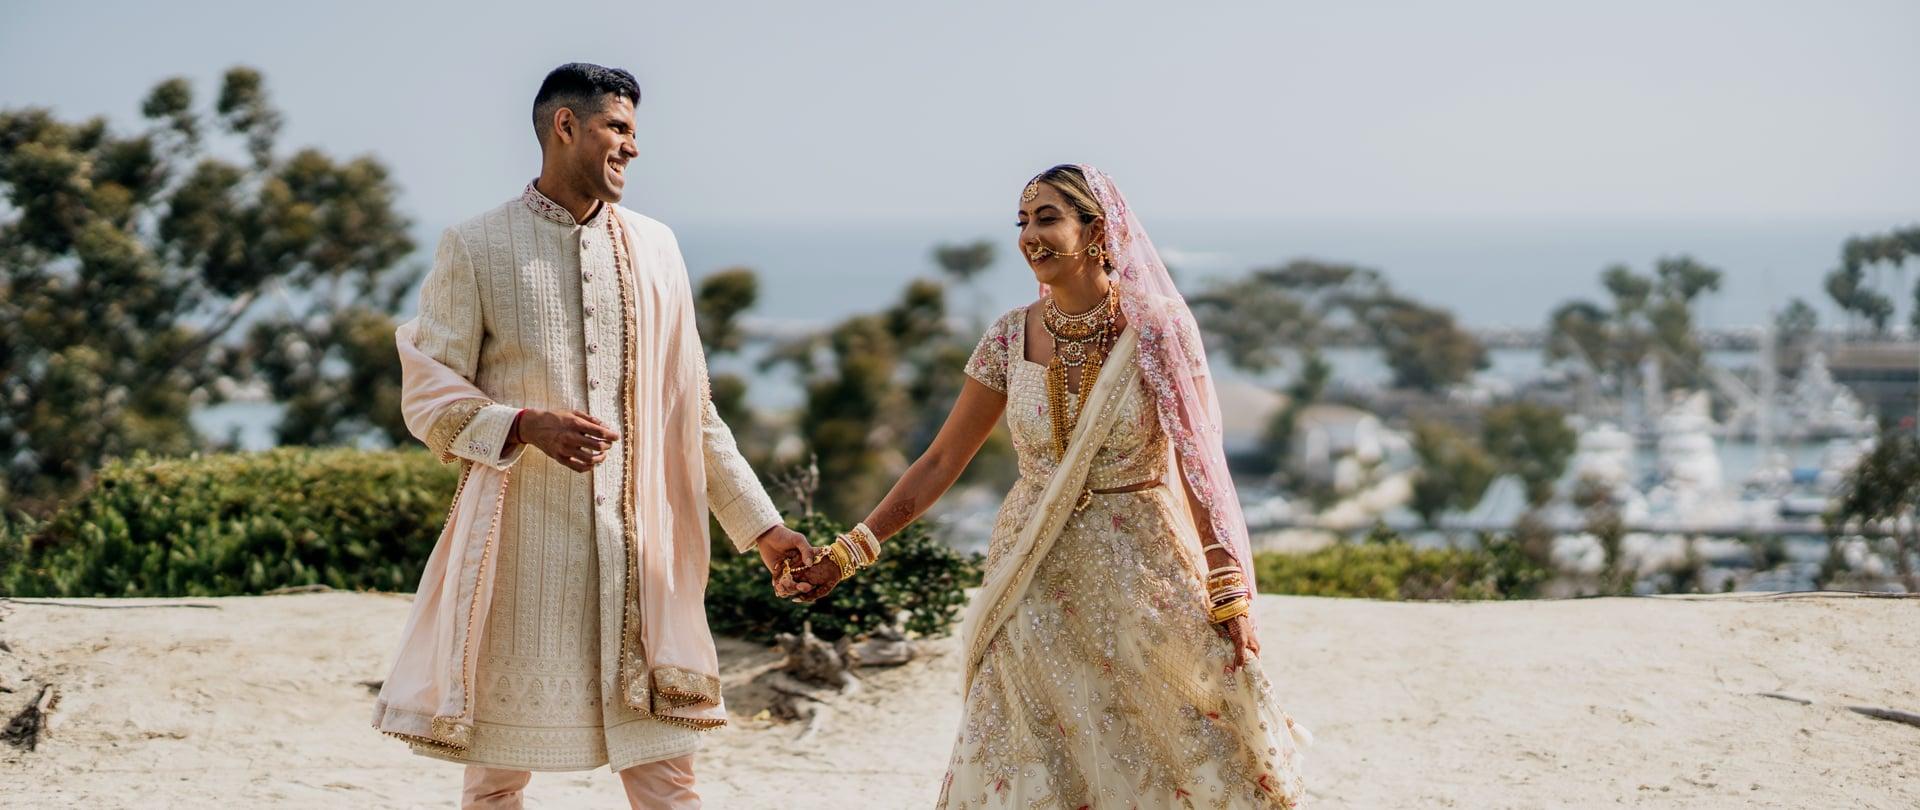 Anjali & Kush Wedding Video Filmed at California, United States